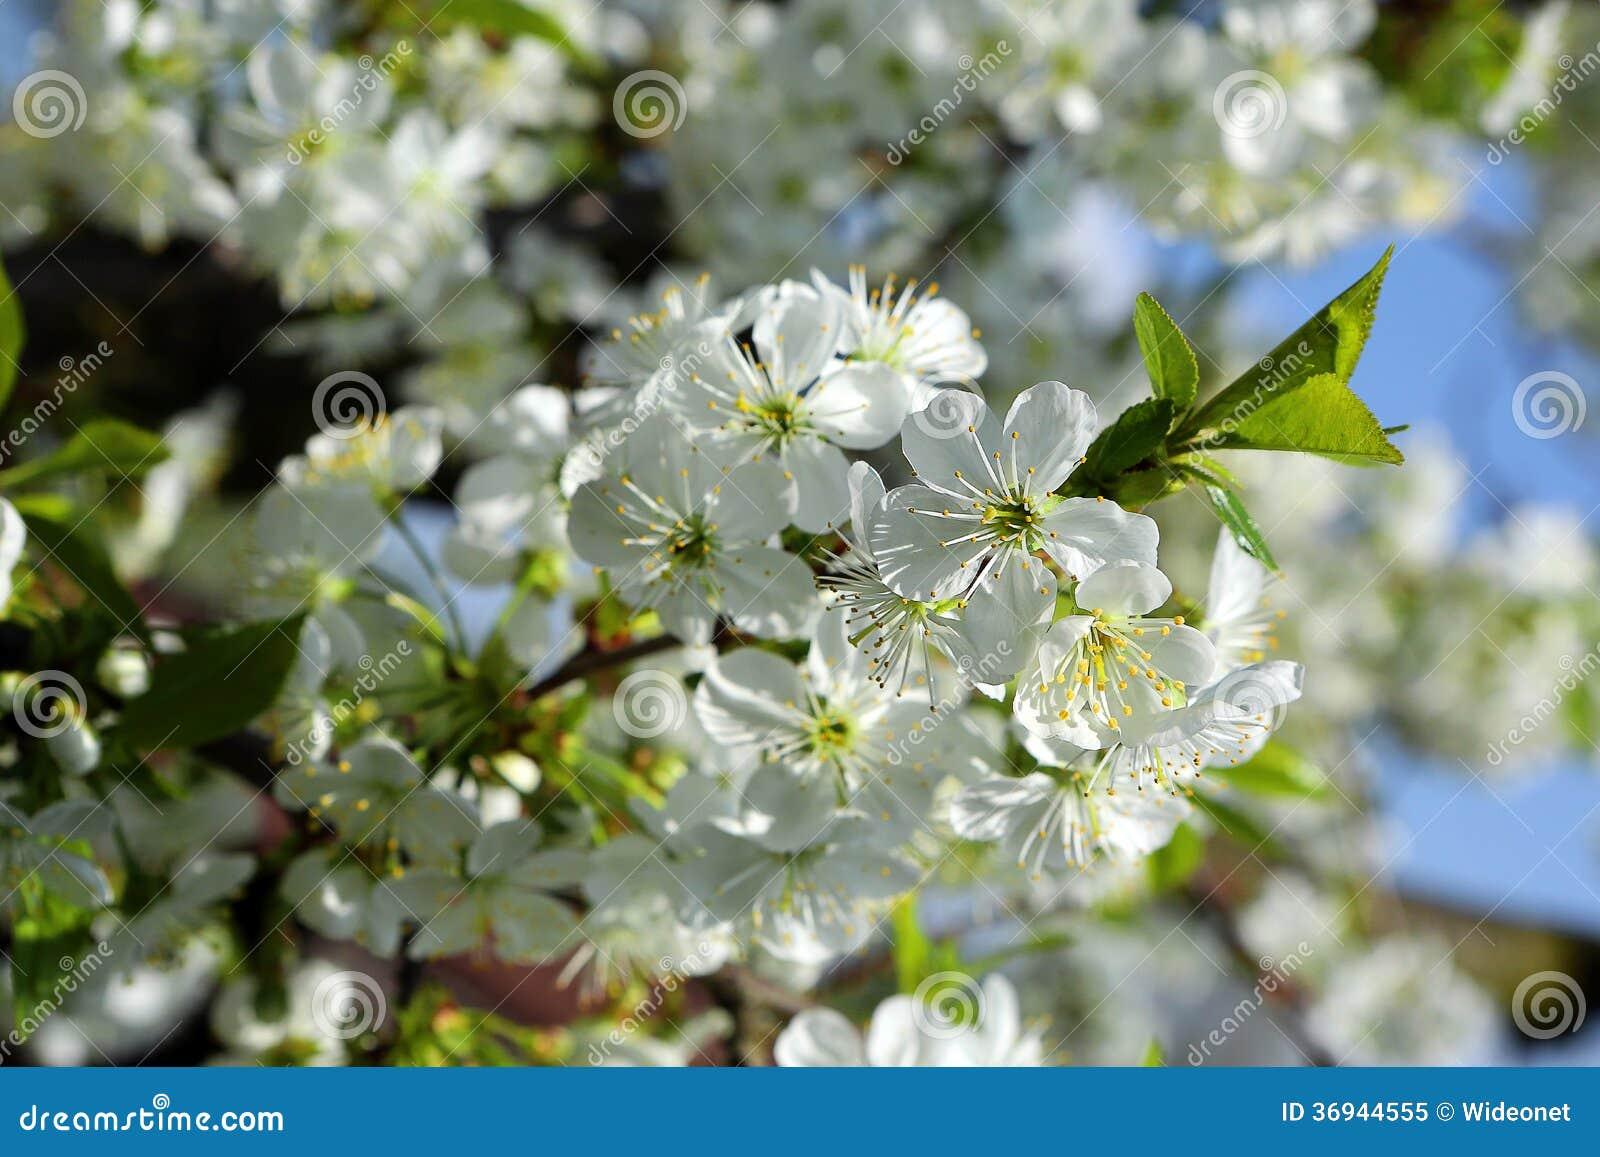 Cherry Tree Spring White Flowers Royalty Free Stock Image